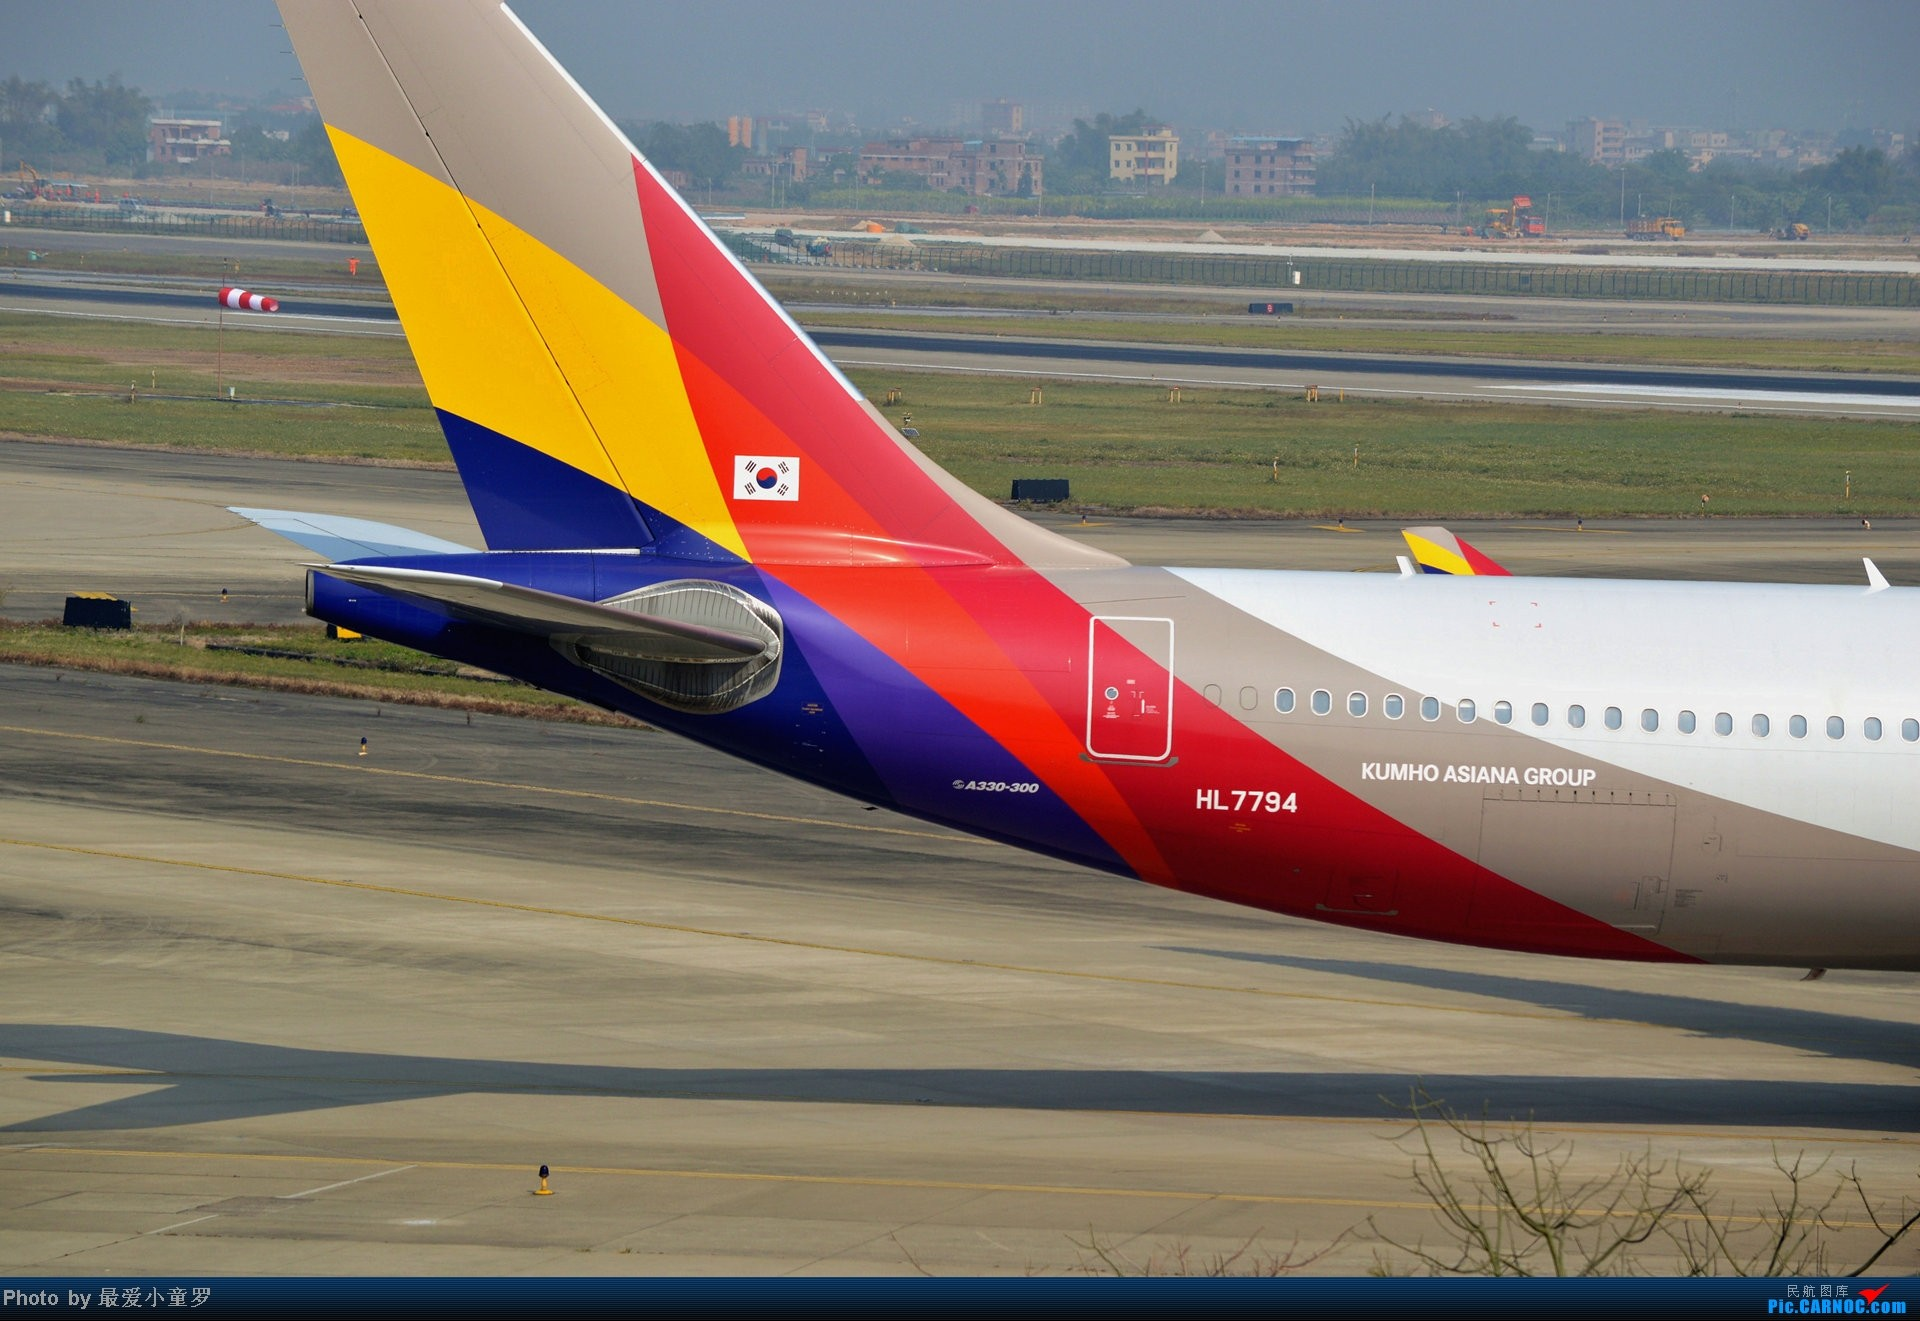 Re:[原创]好天拍机,去年12月21日广州消防塔拍机 AIRBUS A330-300 HL7794